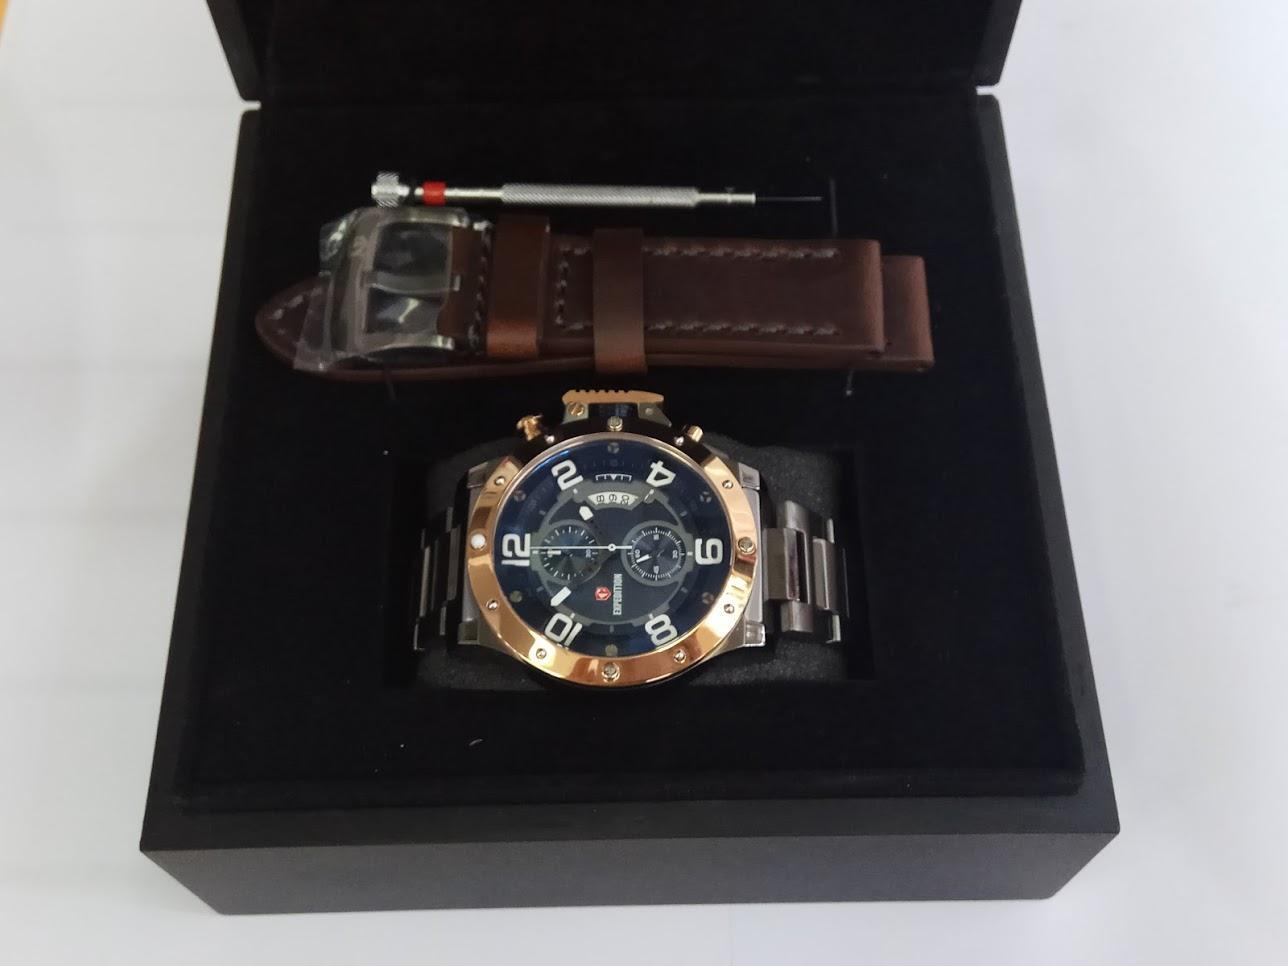 Jual Produk Expedition Terlengkap E6381 Silver Black Couple Original Jam Tangan Pria E6750mc Chronograph Grey Rosegold Stainless Steel